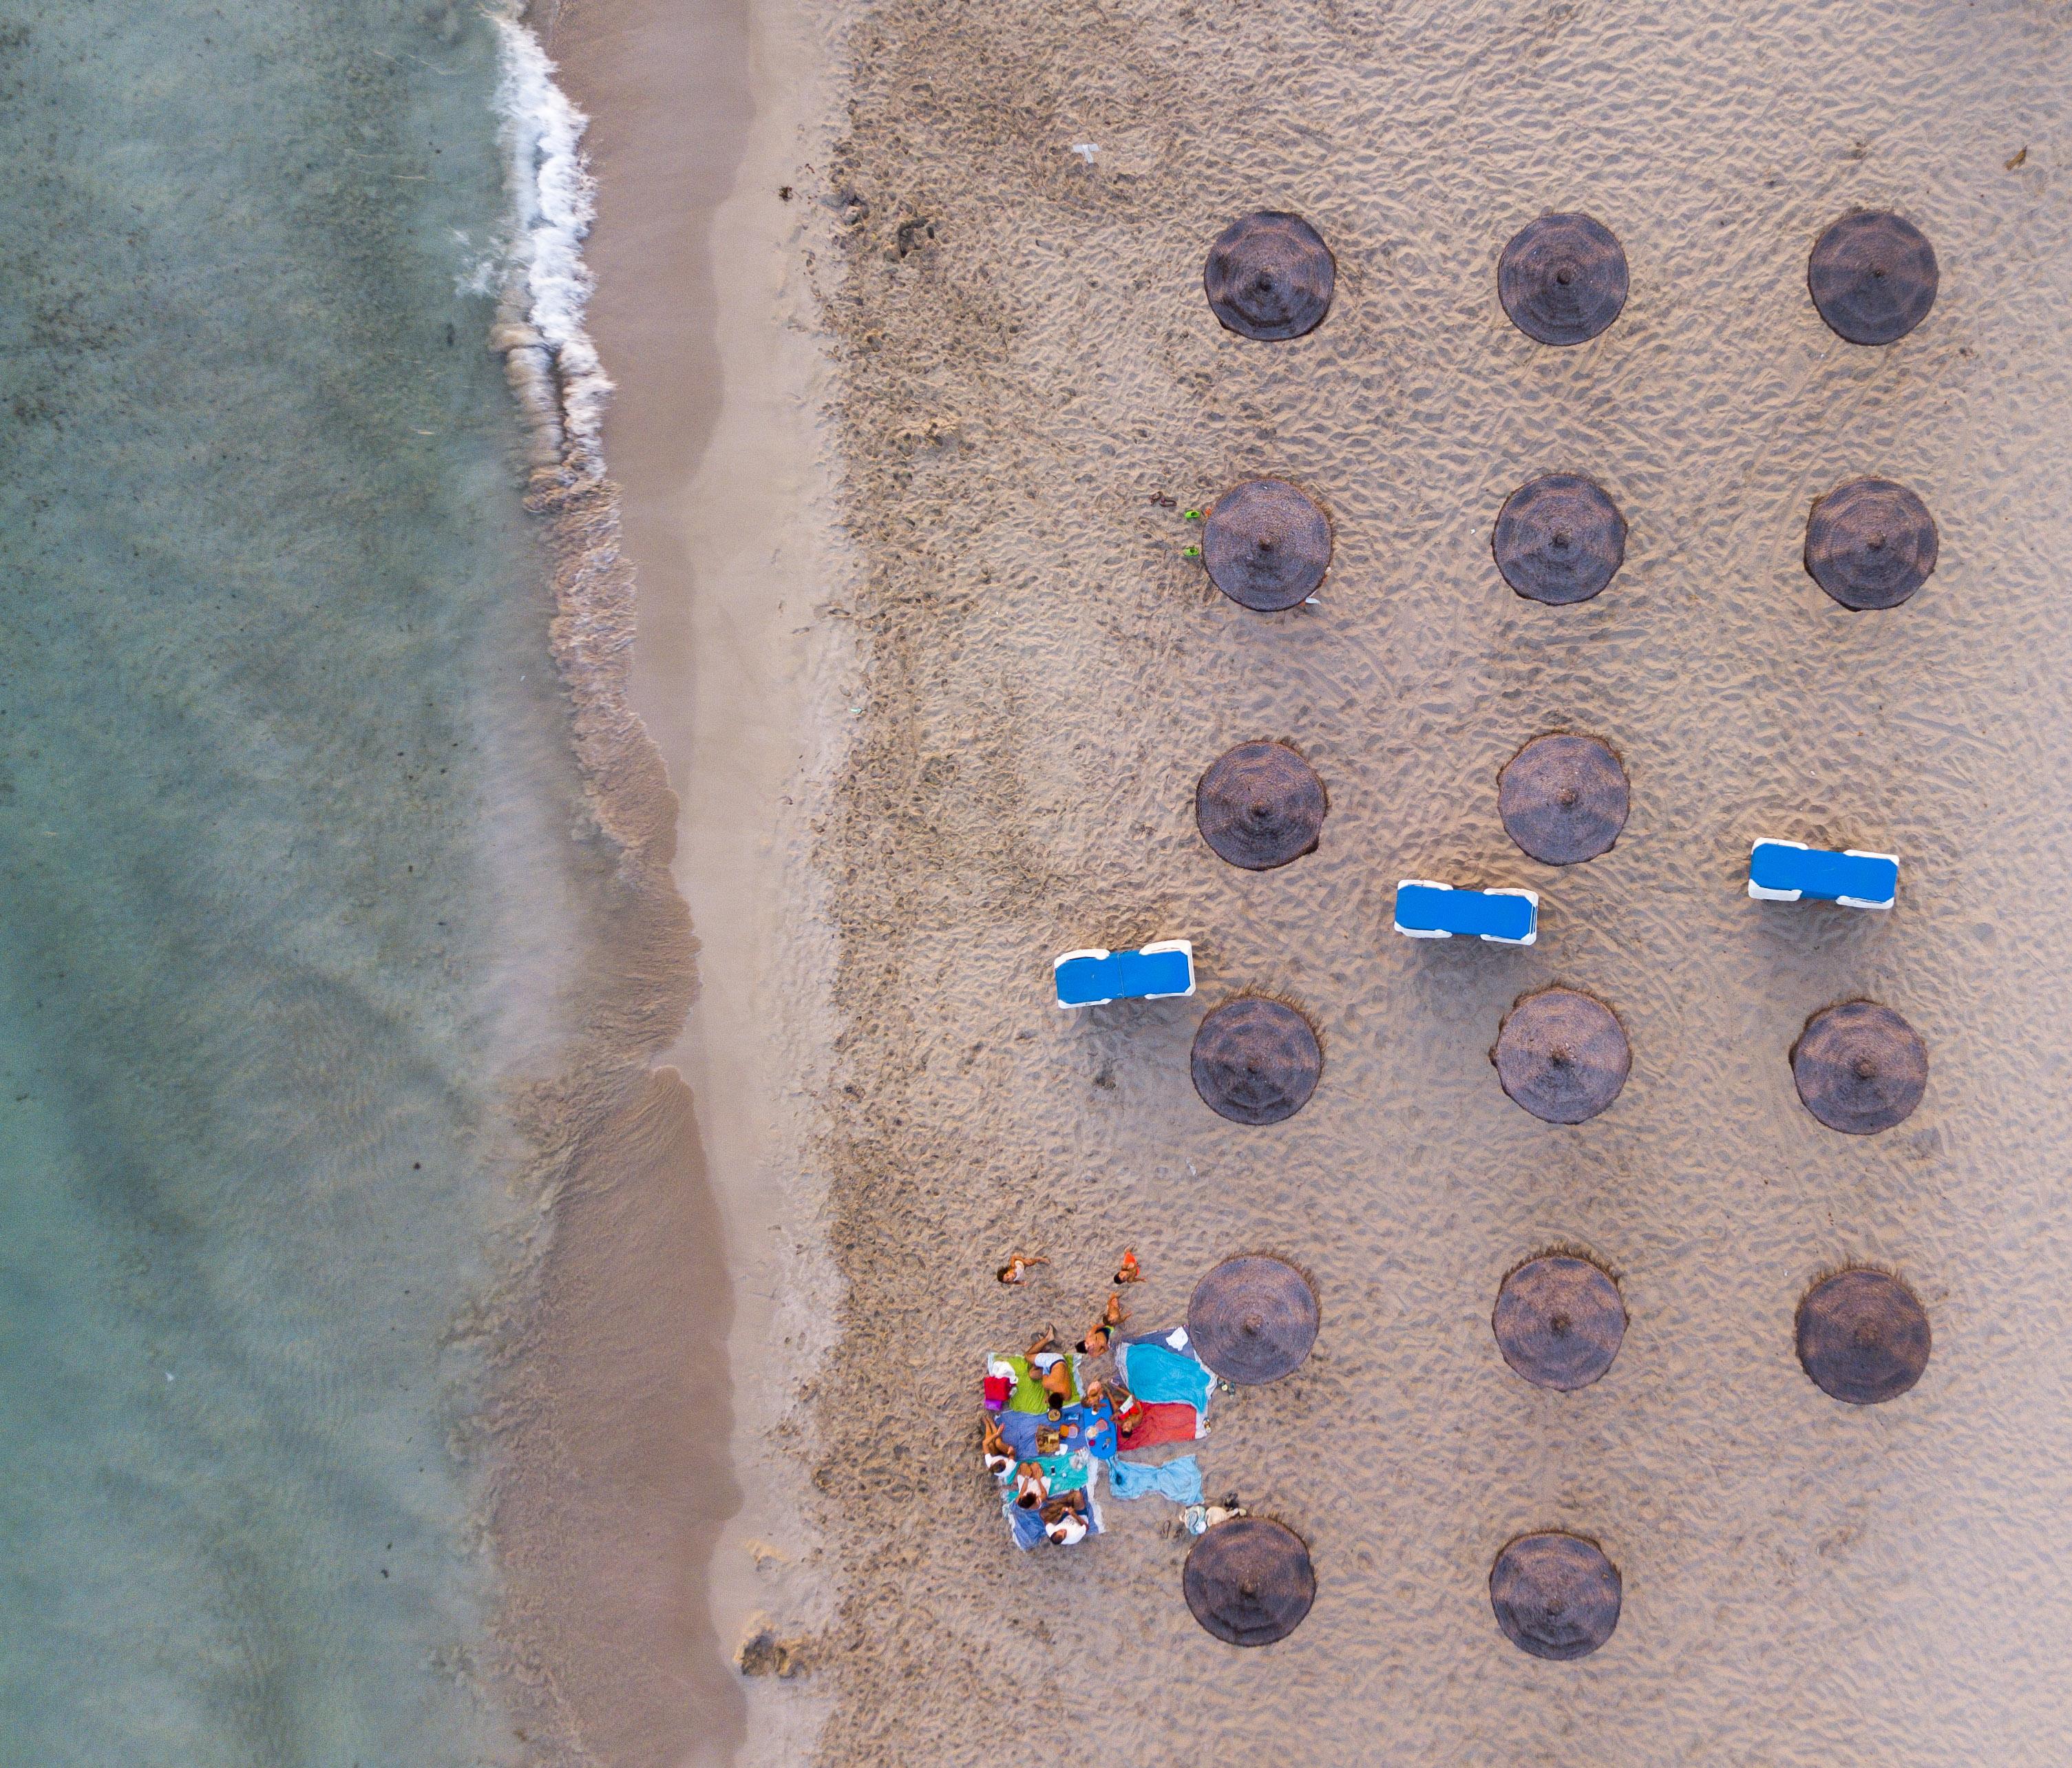 Drone shot of beach Umbrellas